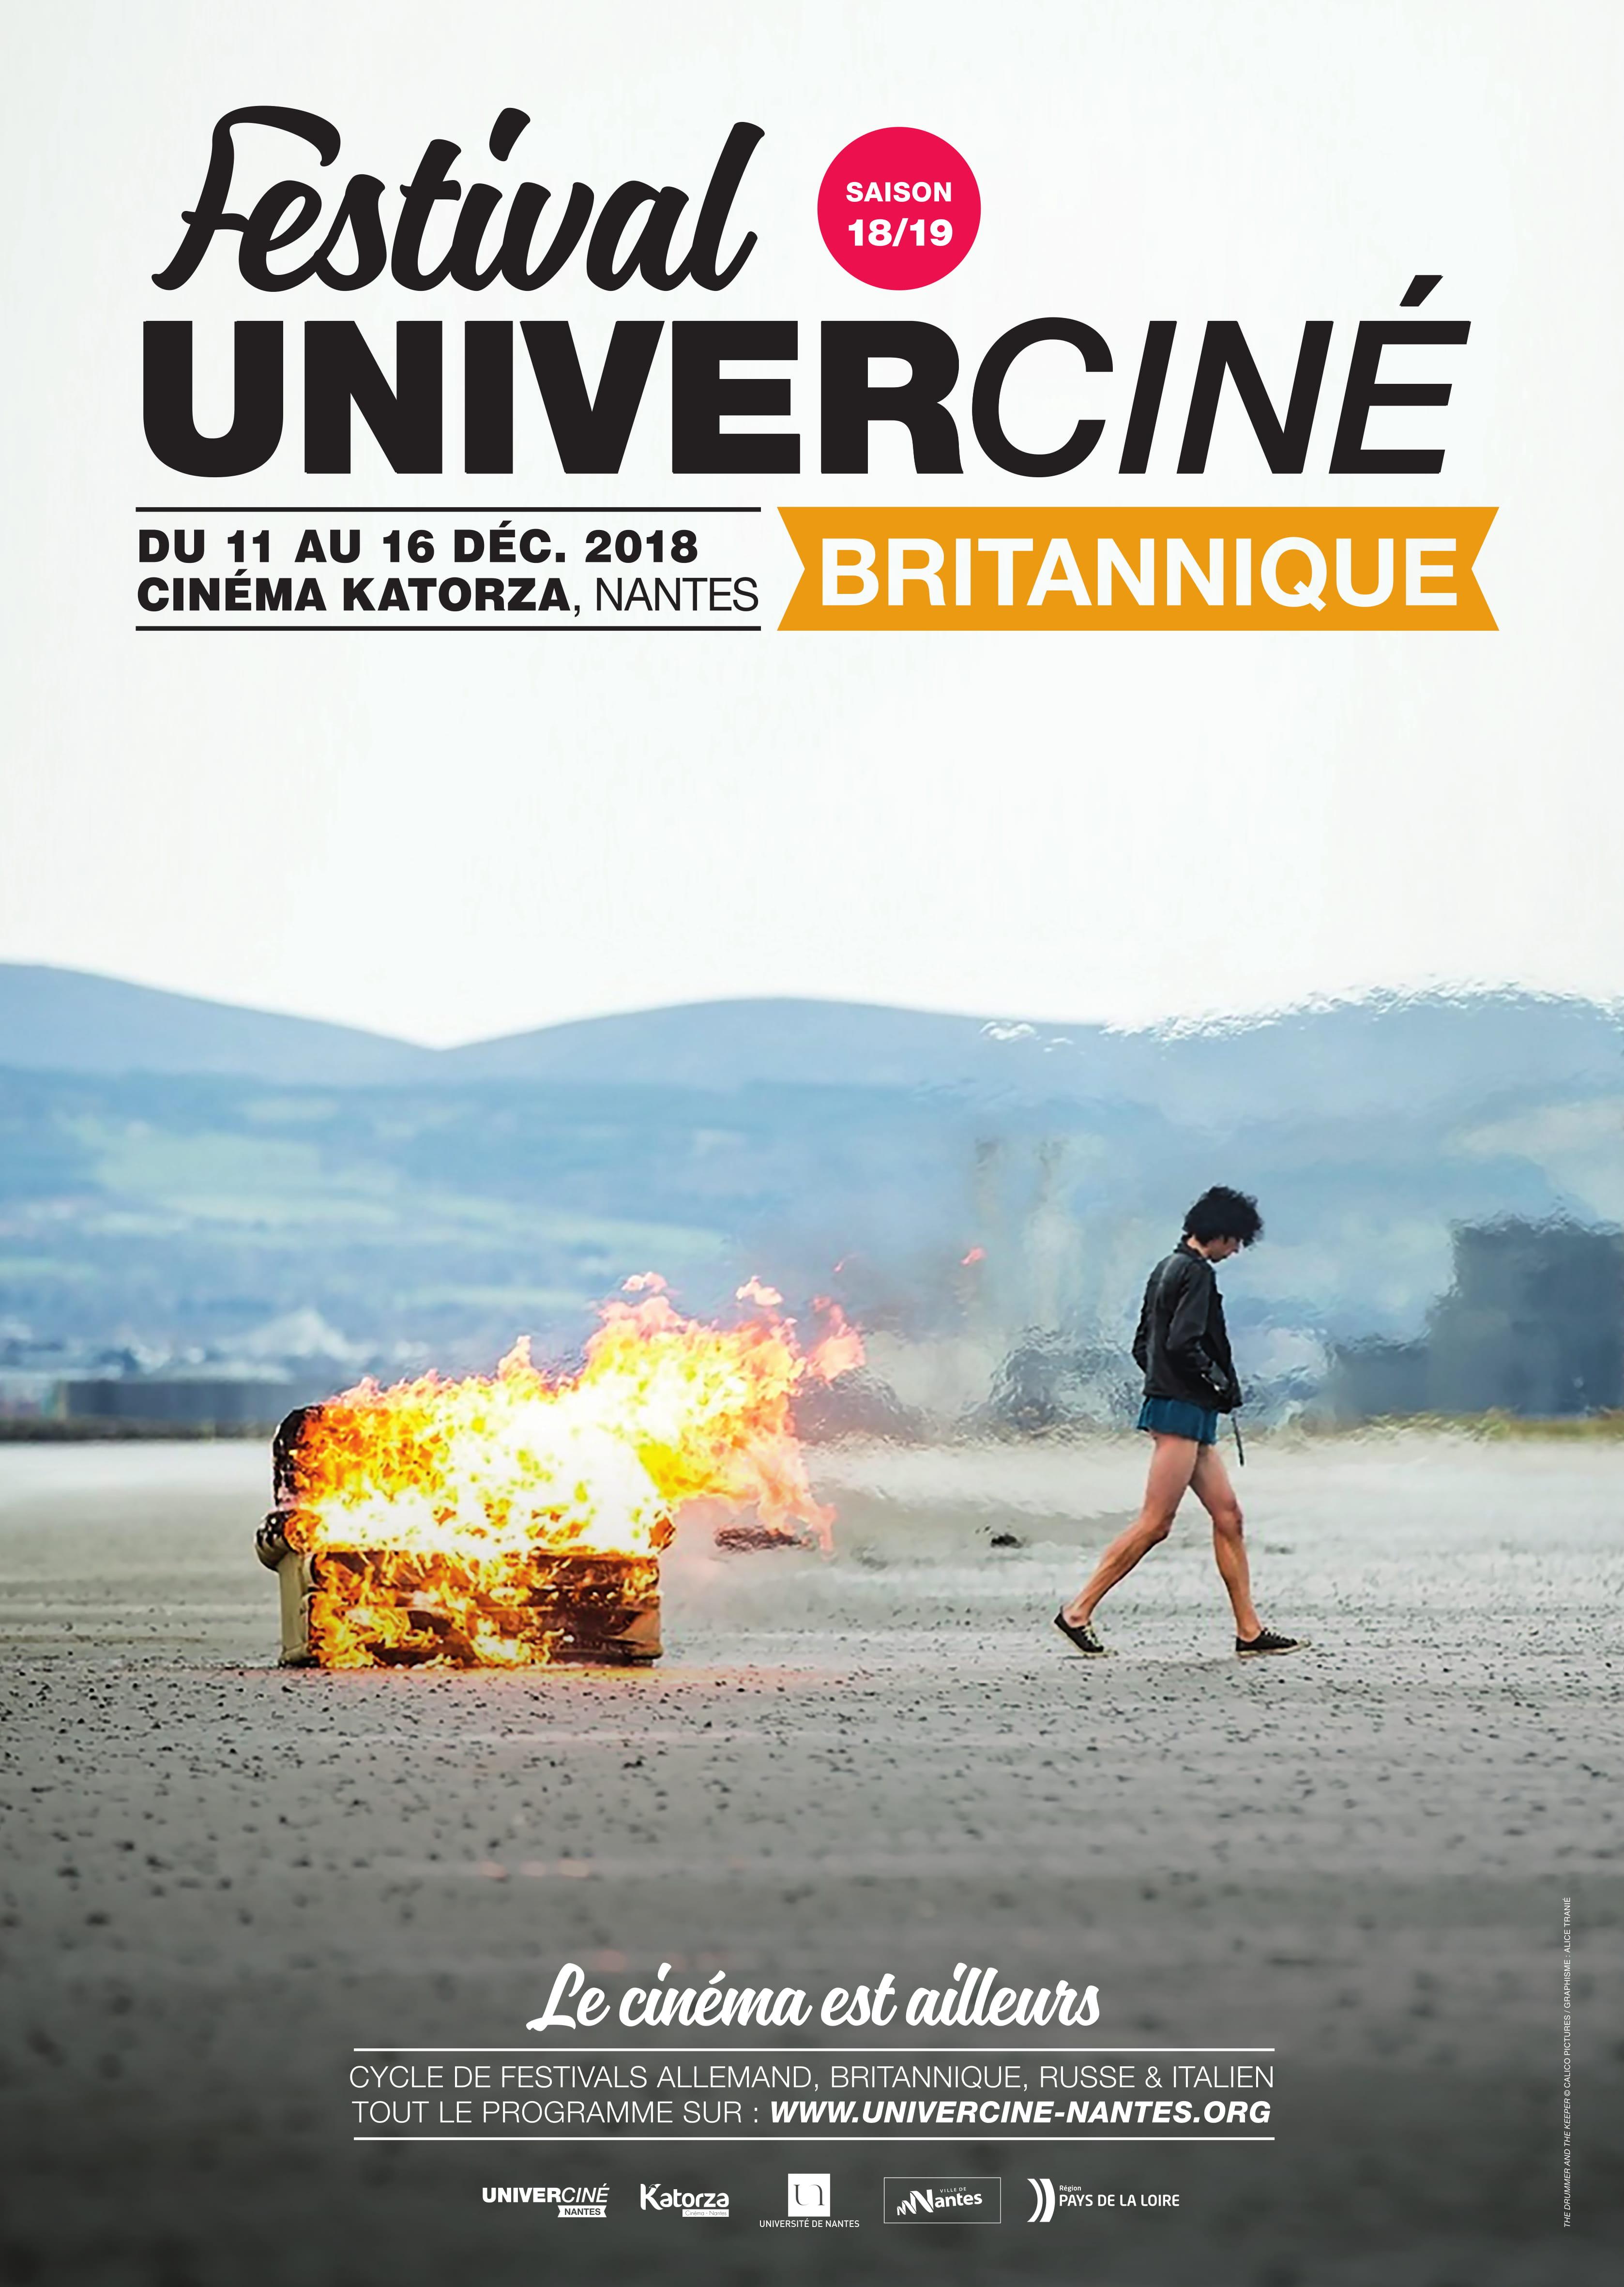 Univerciné britannique 2018/2019